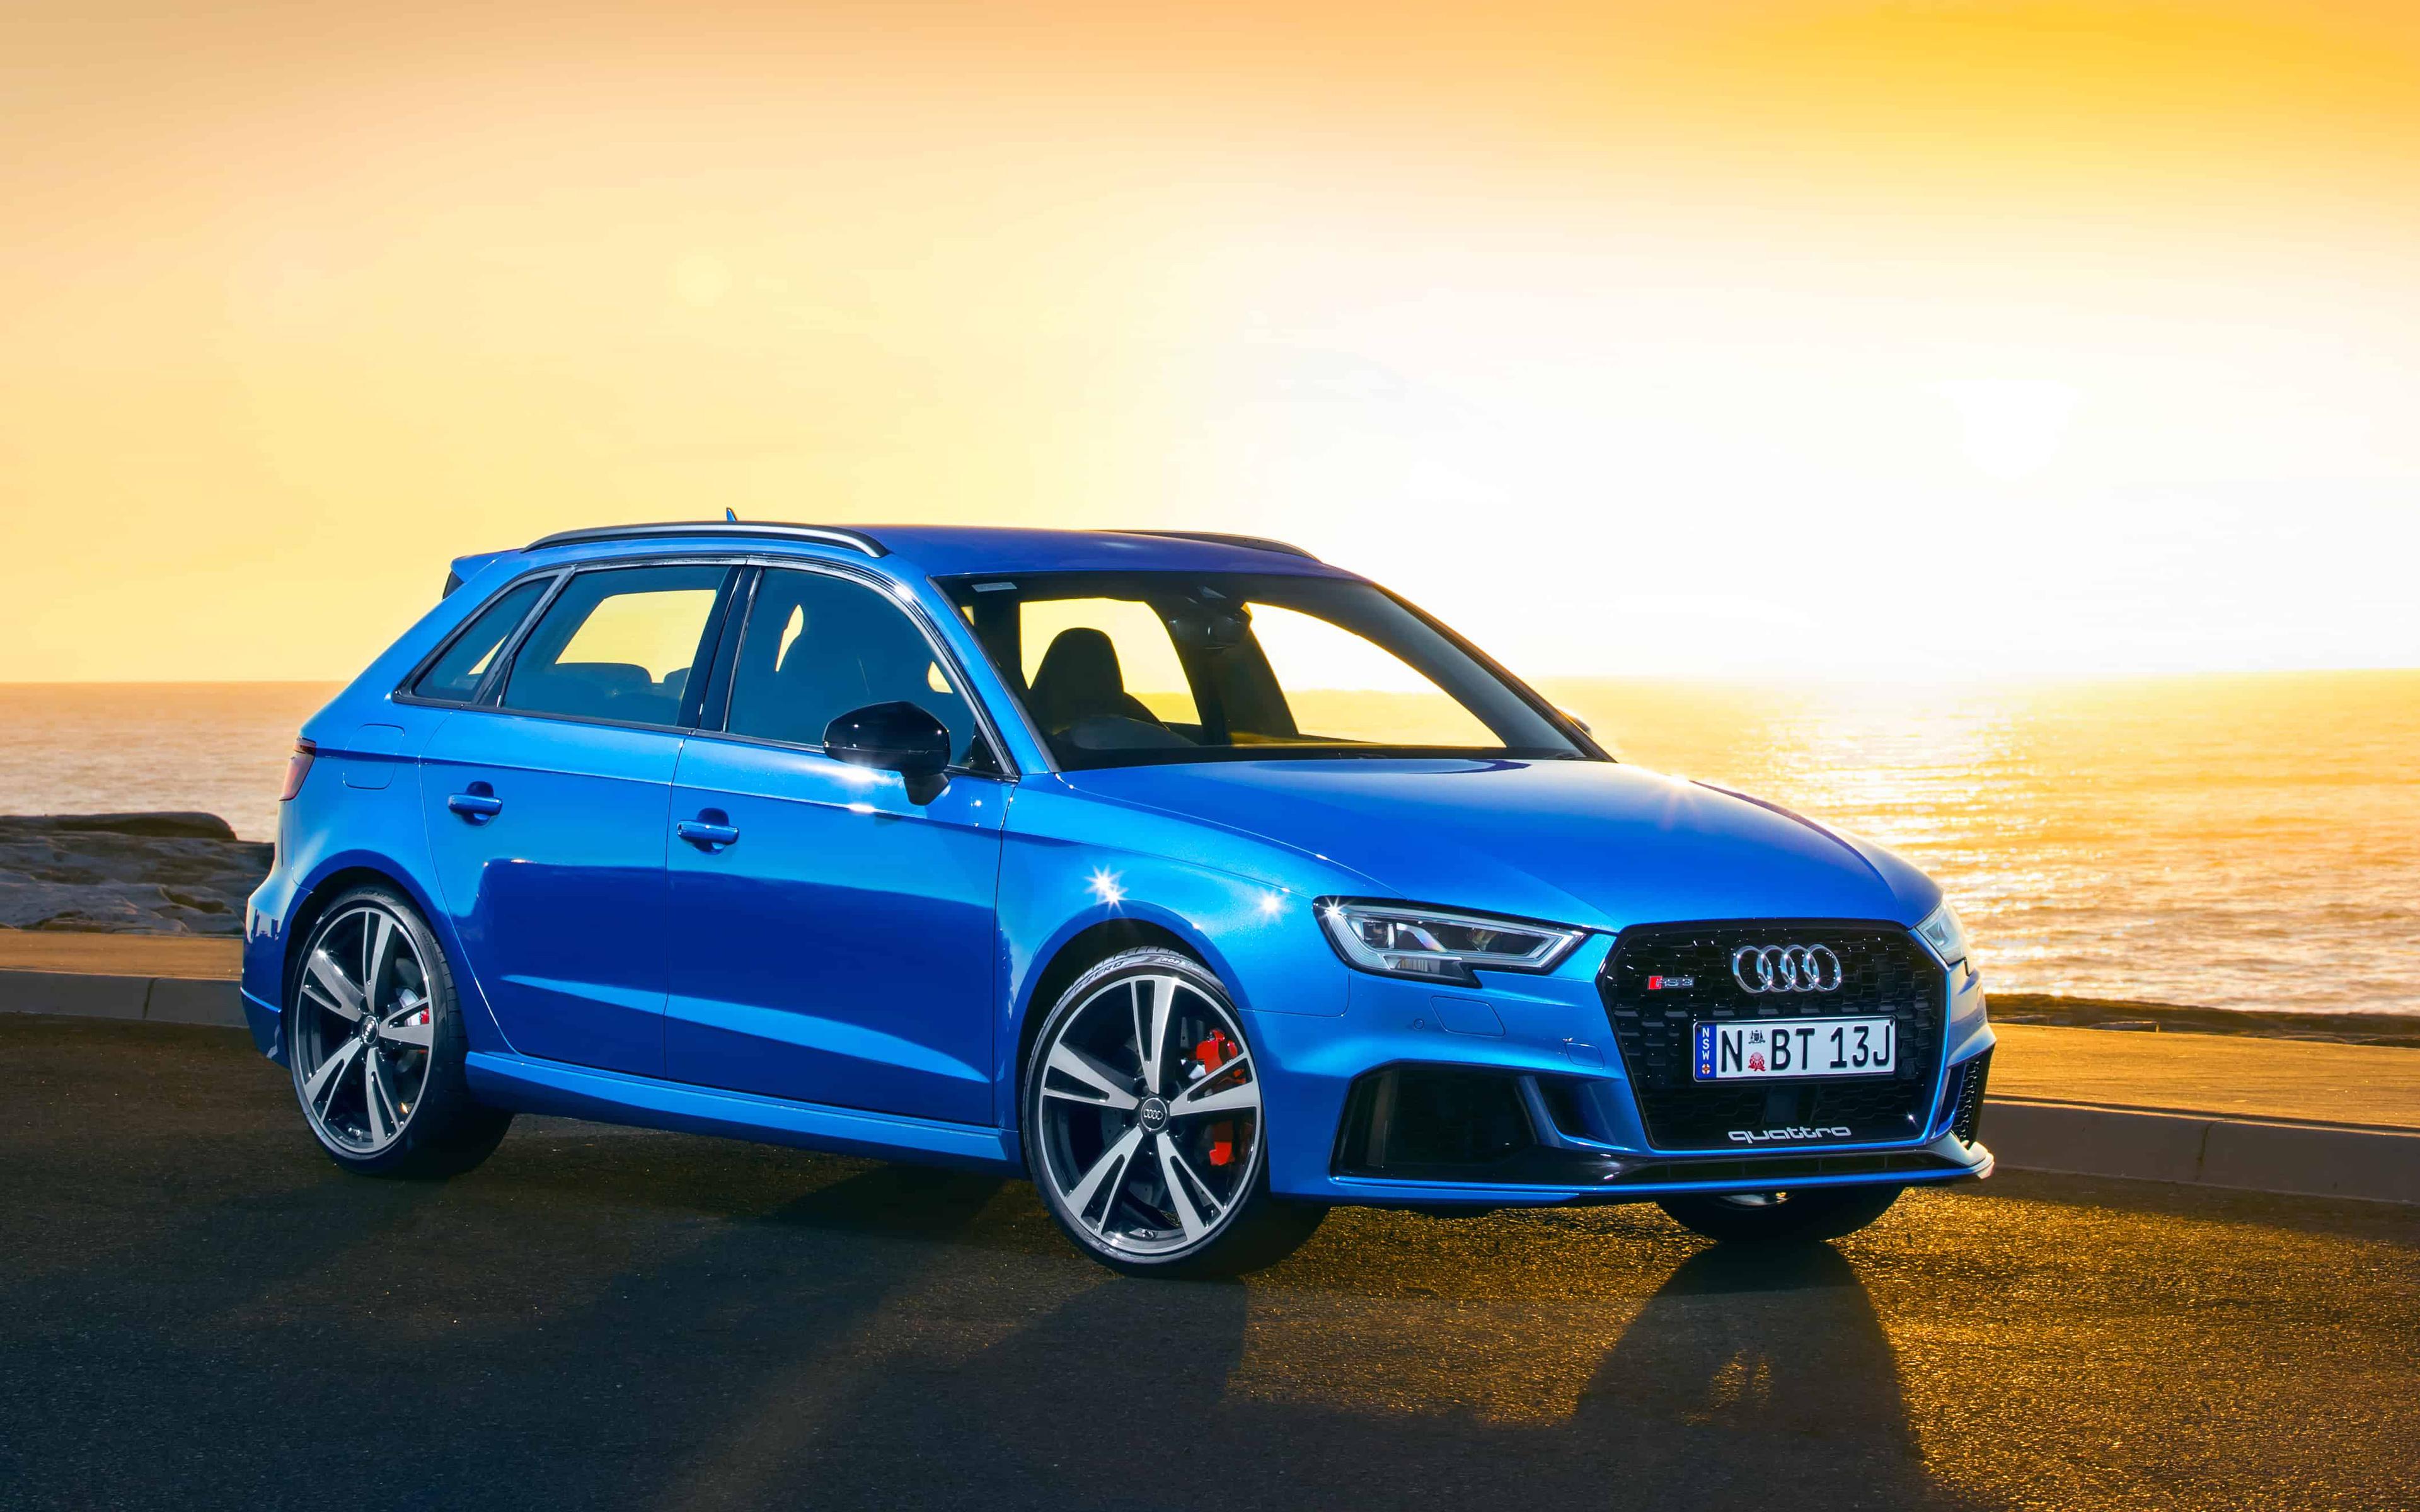 4k Audi Rs3 Sportback 2017 Cars Tuning Blue Rs3 Audi Rs3 Sportback 2179151 Hd Wallpaper Backgrounds Download